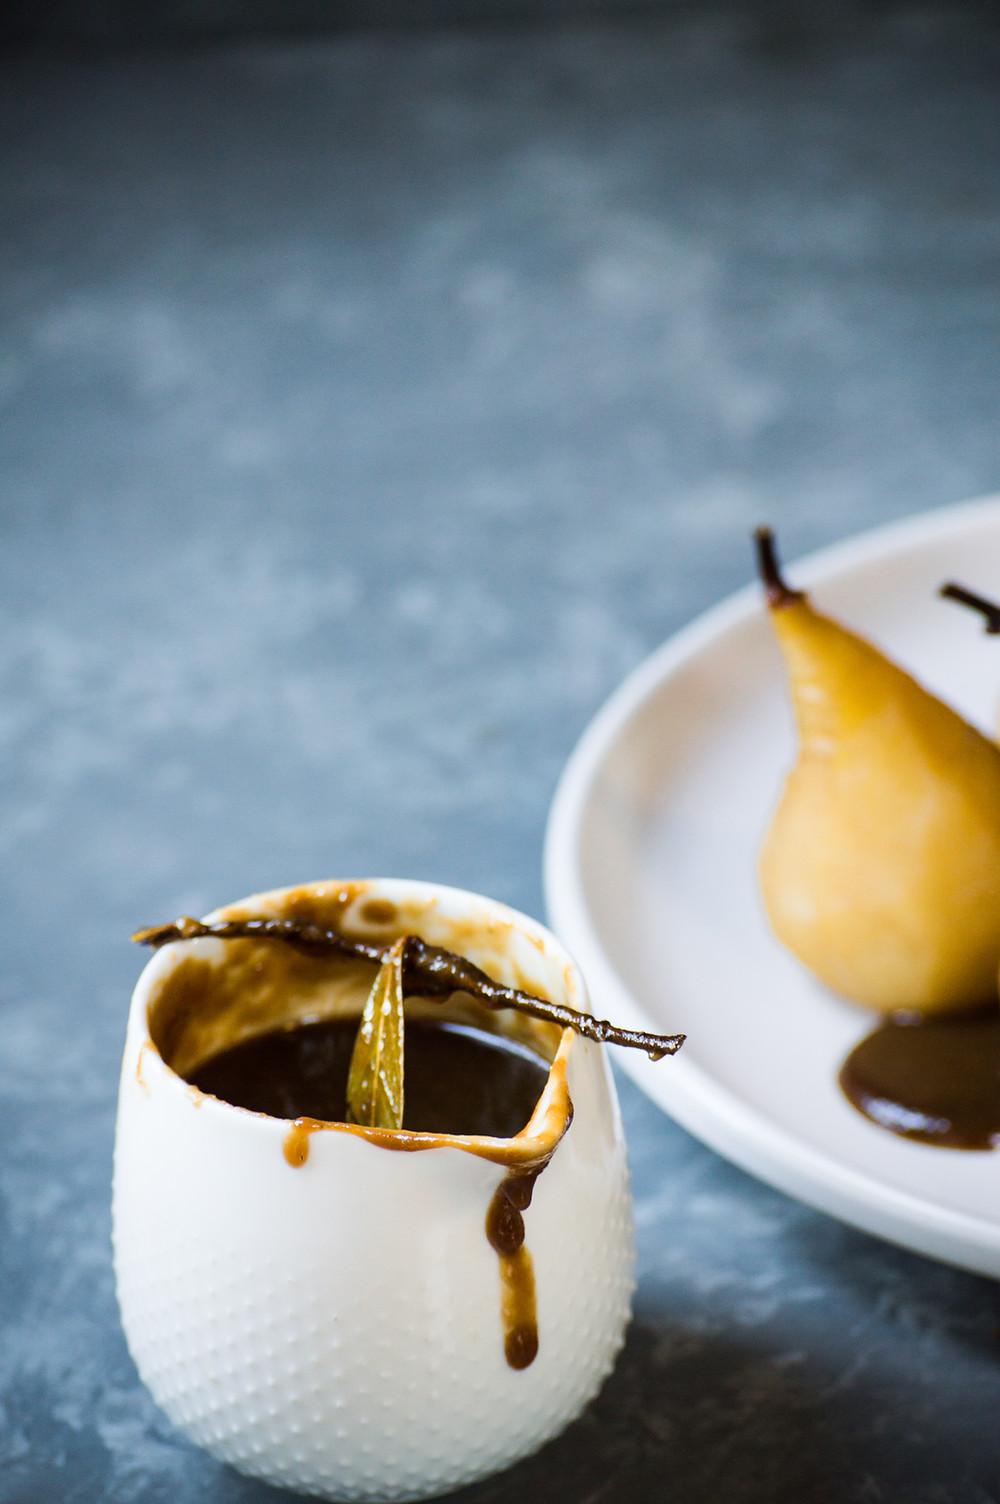 Spiced caramel sauce, poached pears, bay leaf